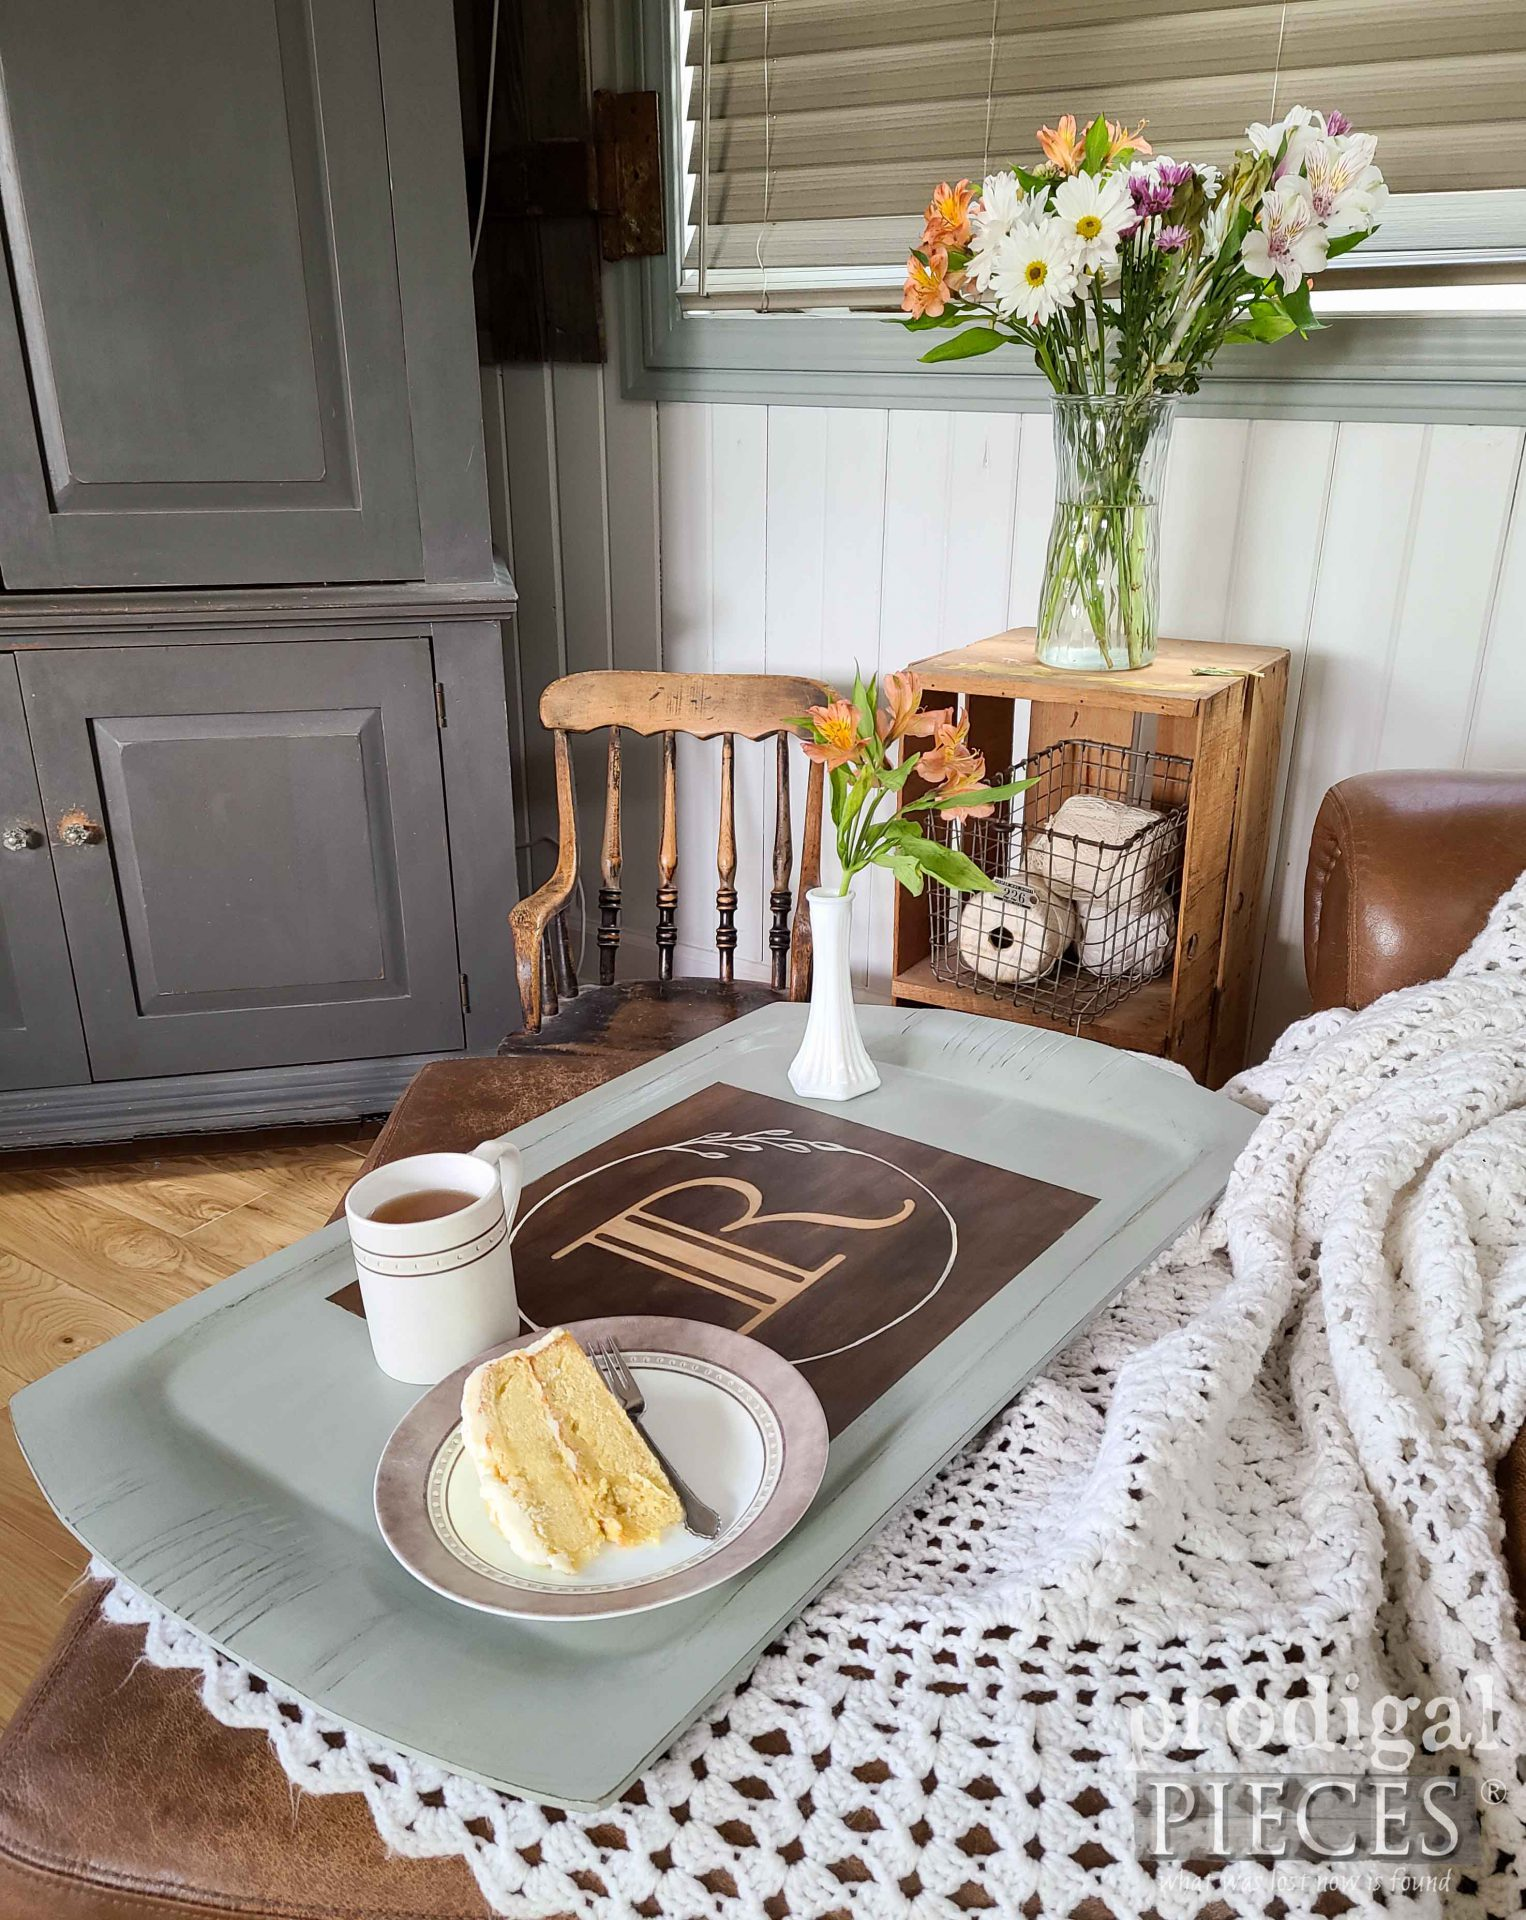 Farmhouse Monogram Serving Tray by Larissa of Prodigal Pieces | prodigalpieces.com #prodigalpieces #vintage #home #homedecor #farmhouse